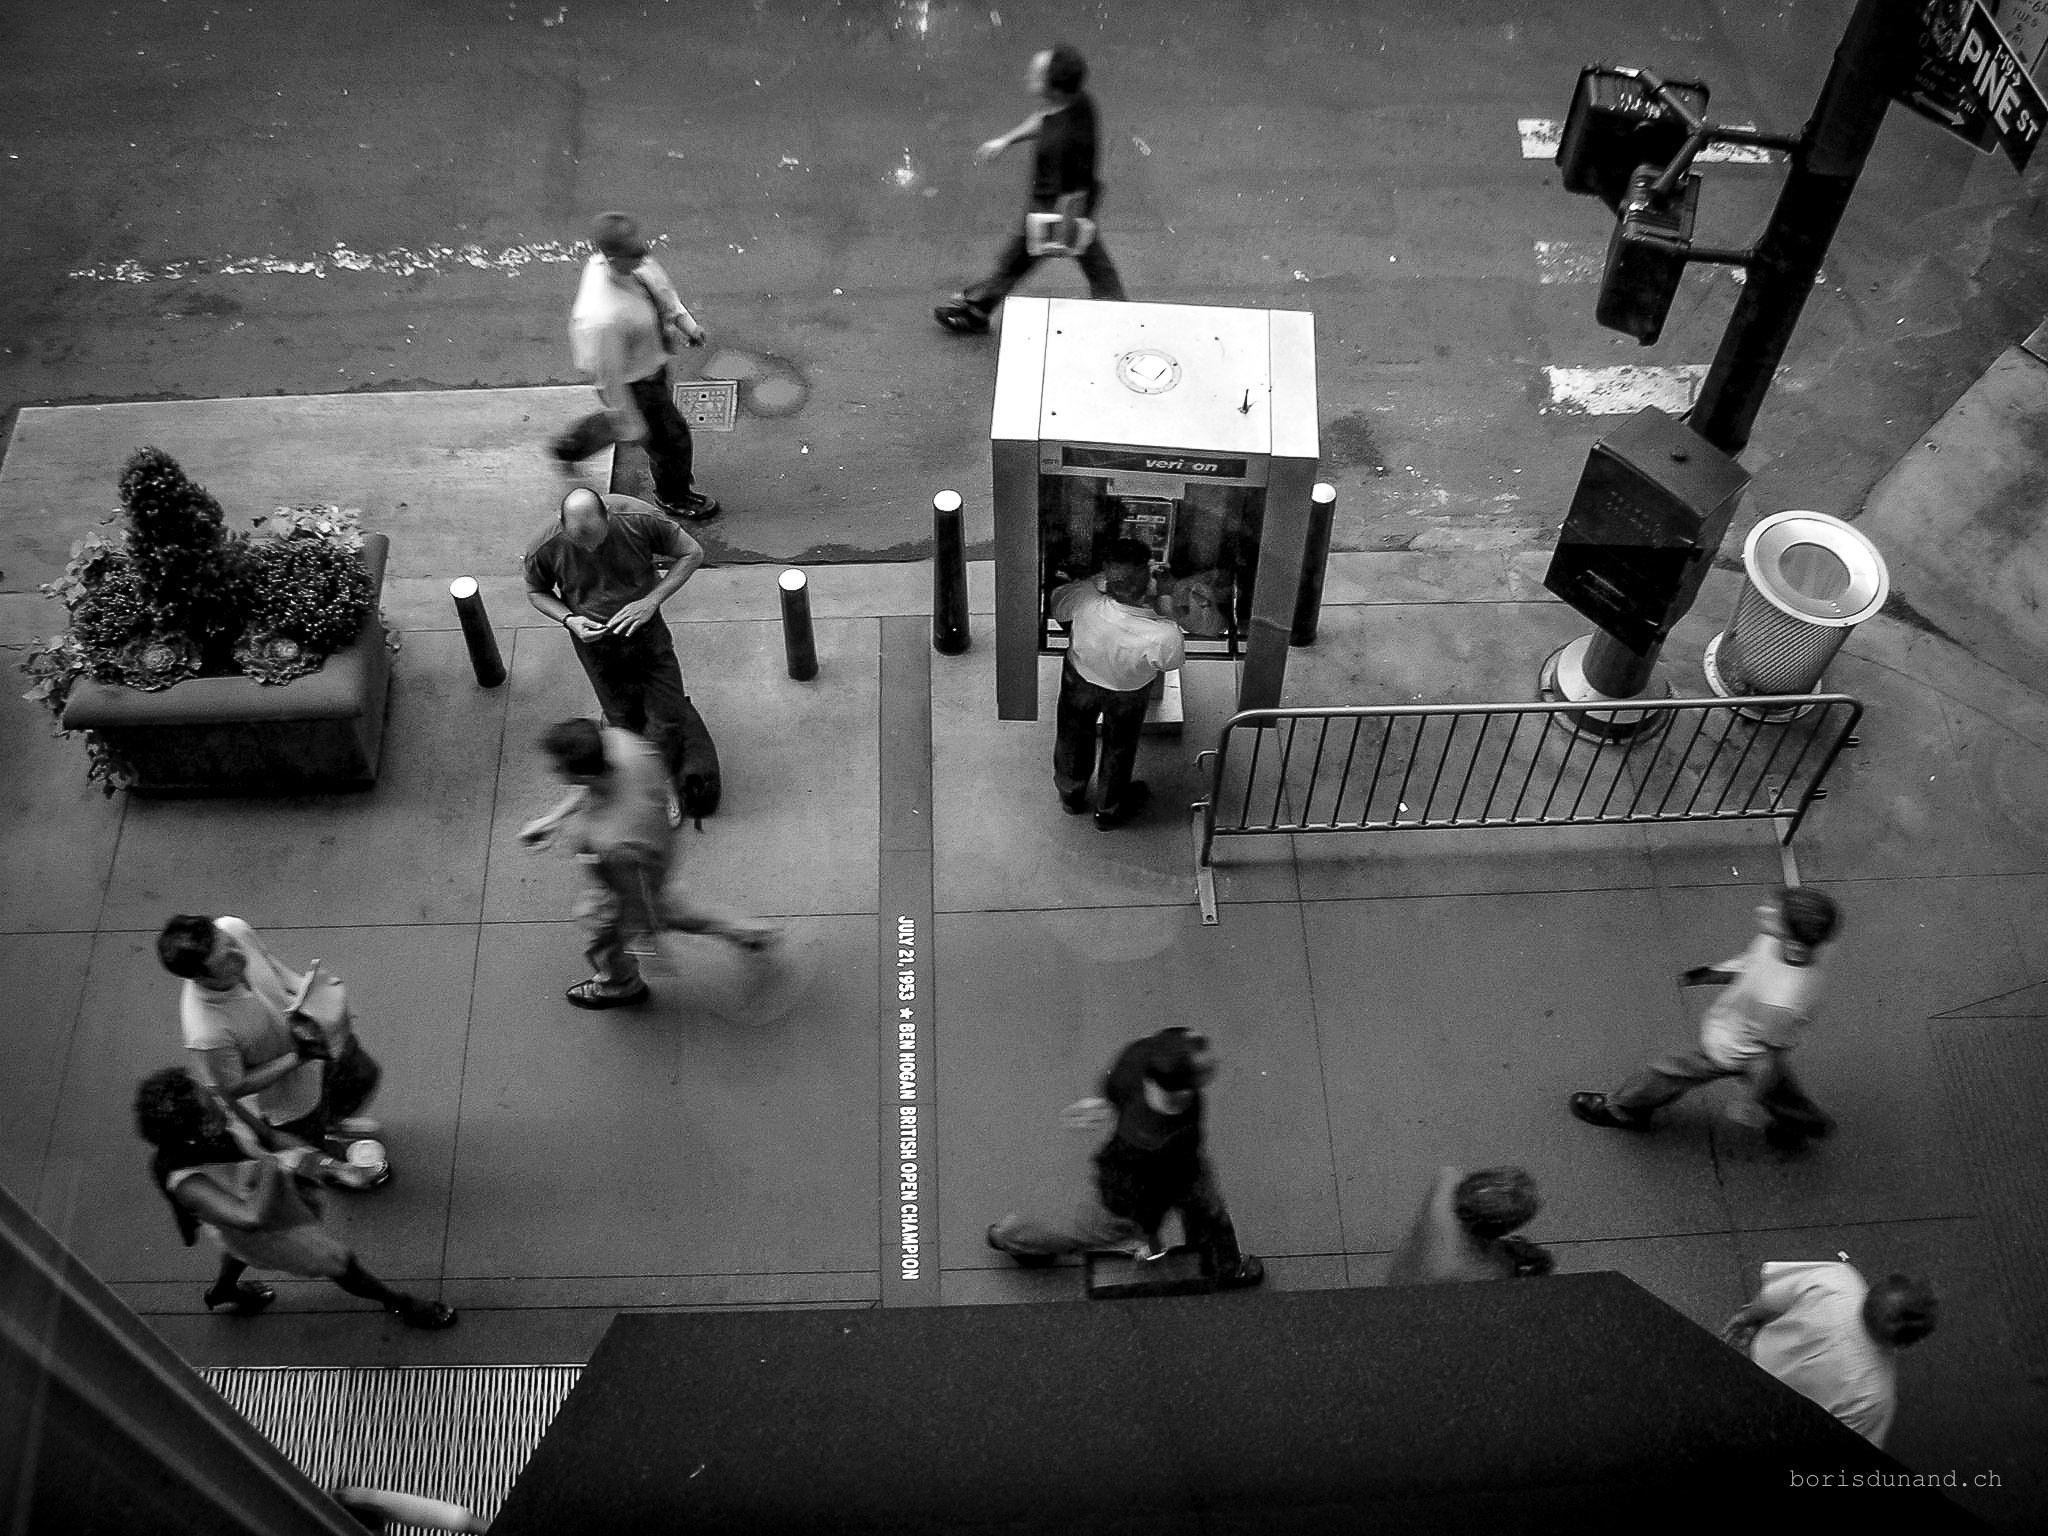 photographe genève boris dunand